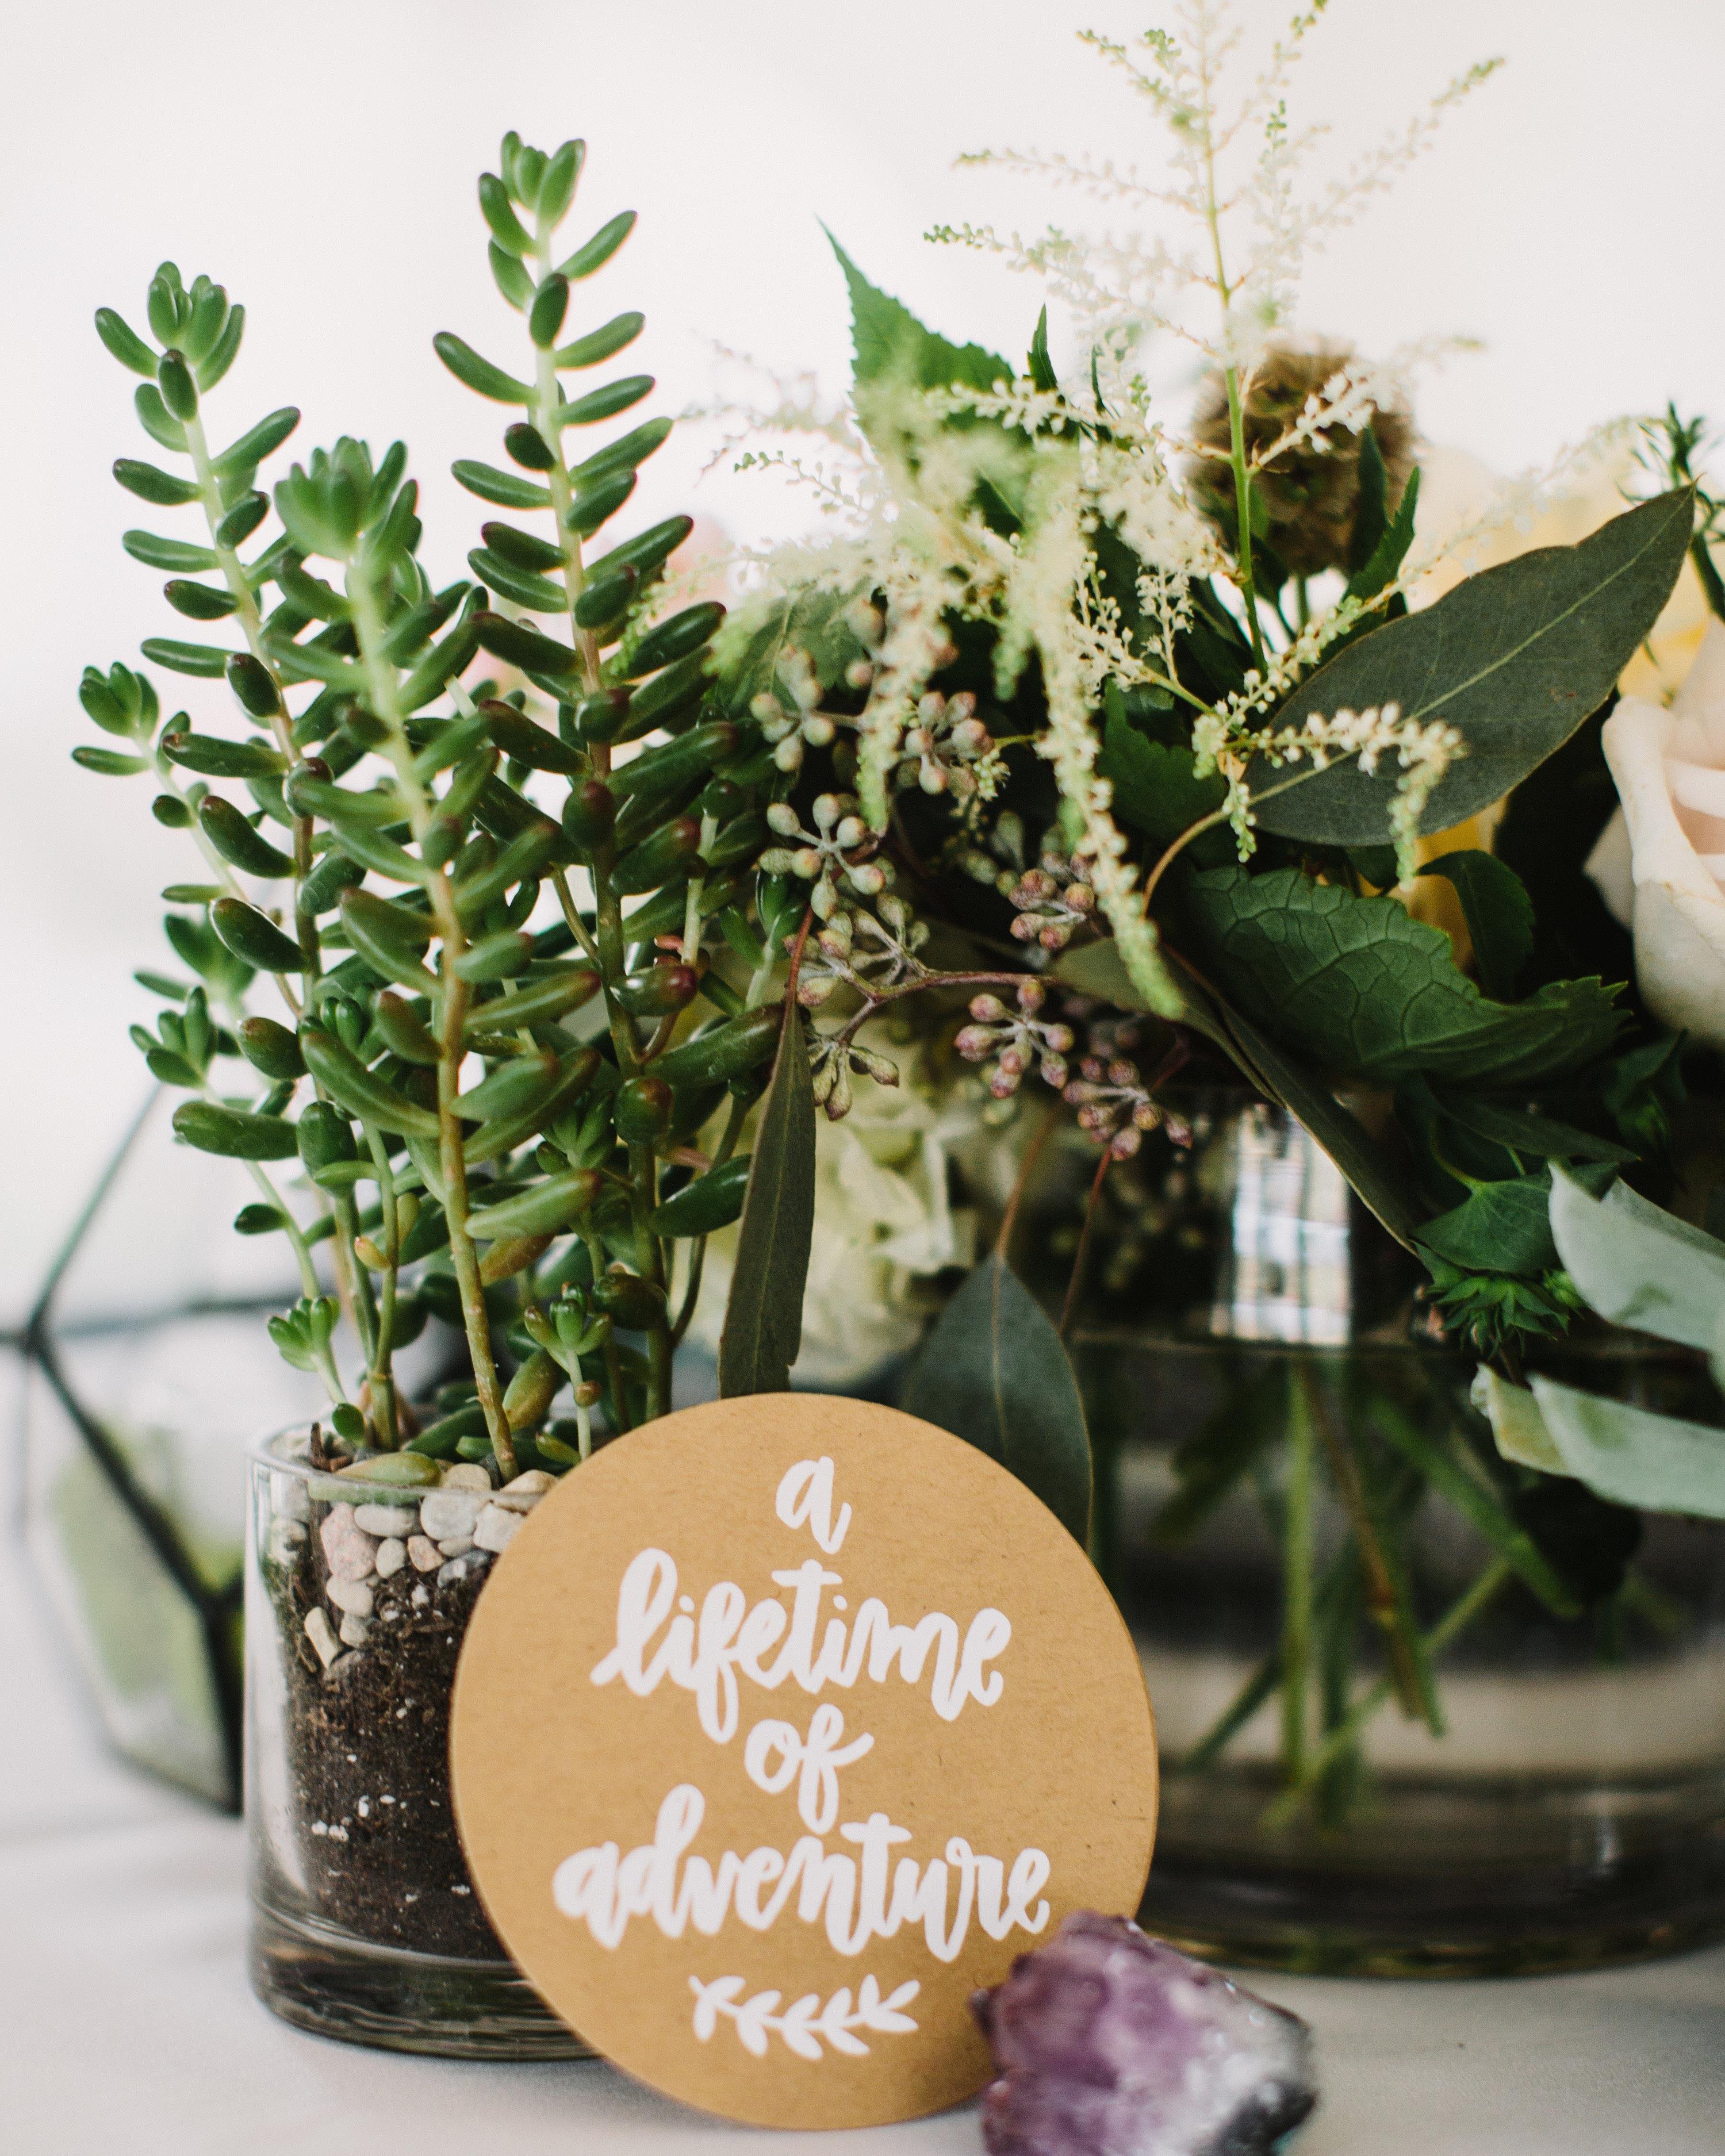 kristen-steve-wedding-centerpieces-015-s113058-0616.jpg